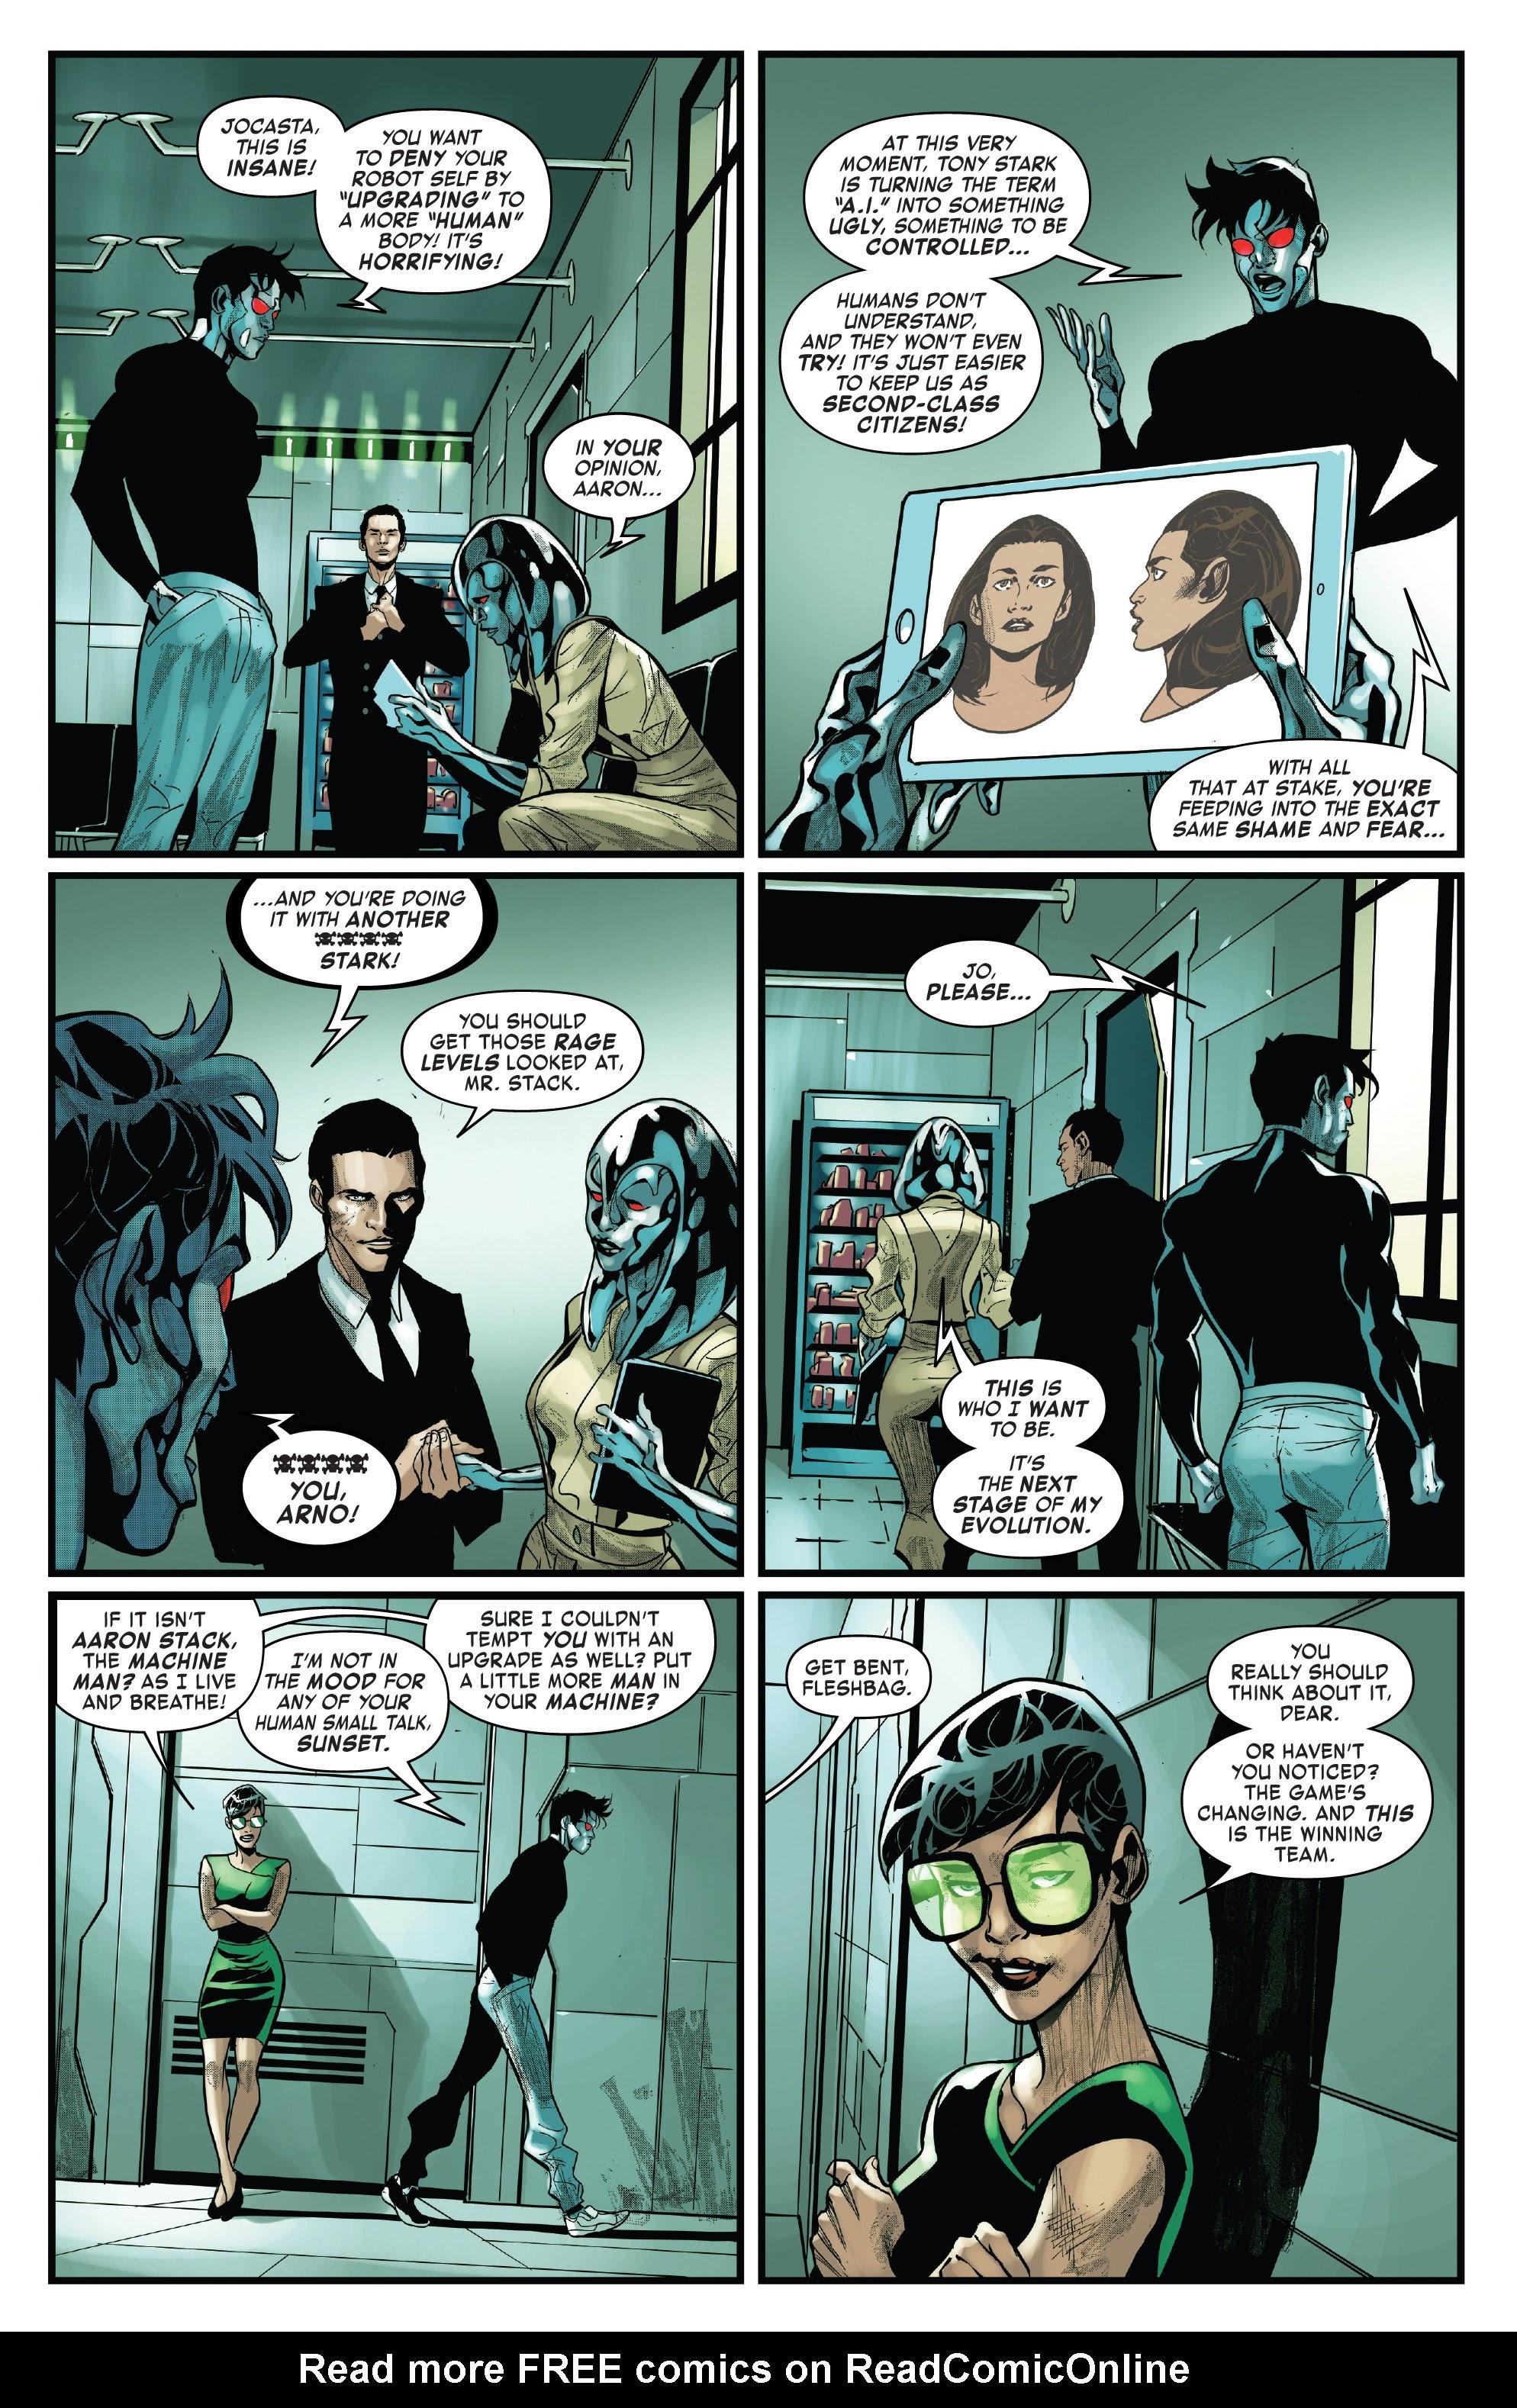 Read online Tony Stark: Iron Man comic -  Issue #15 - 6